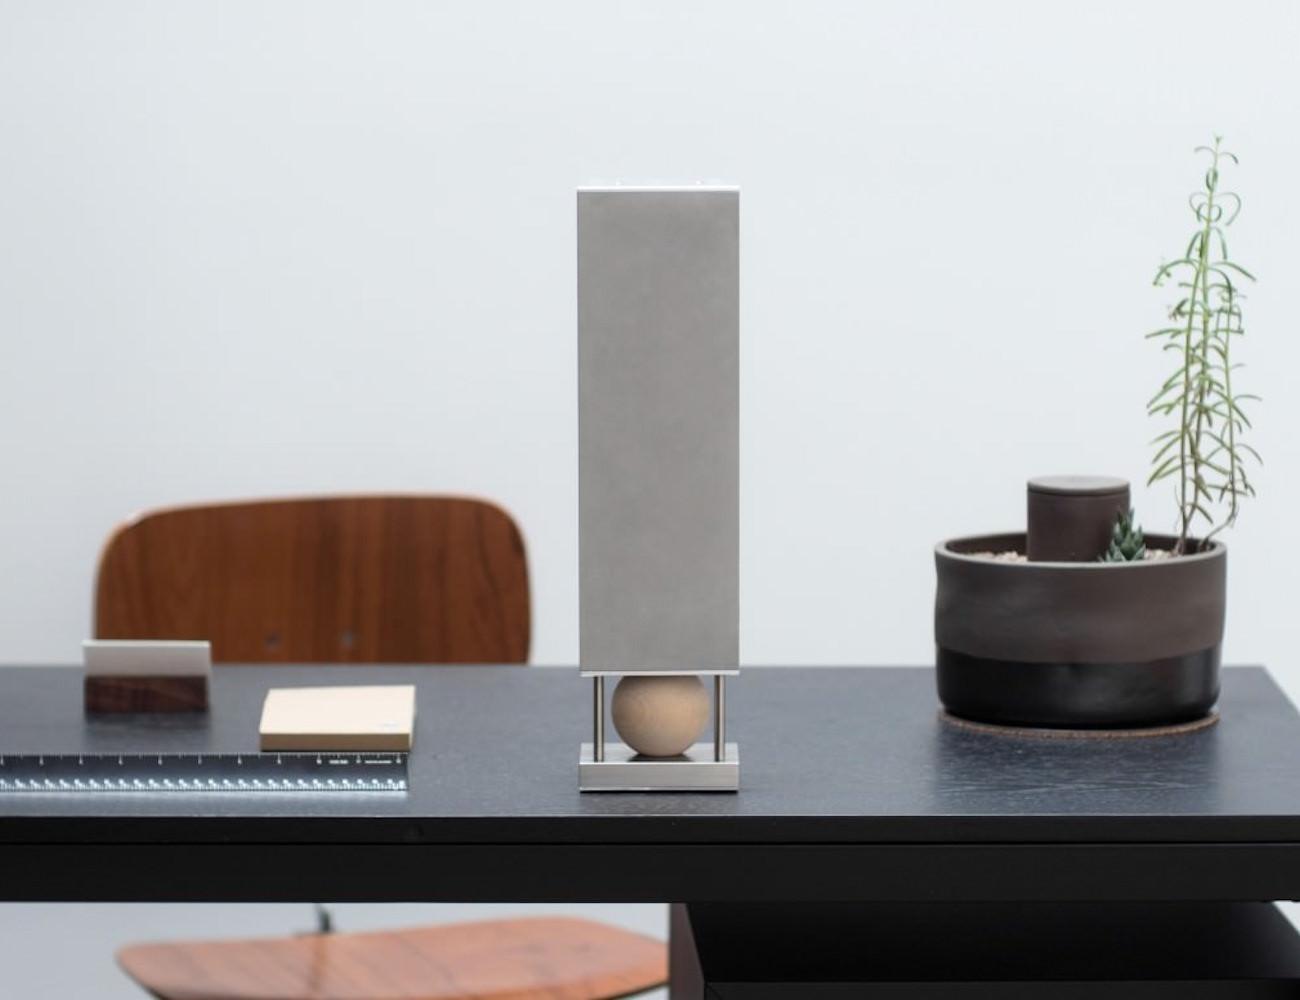 Steel+Speaker+By+Joey+Roth